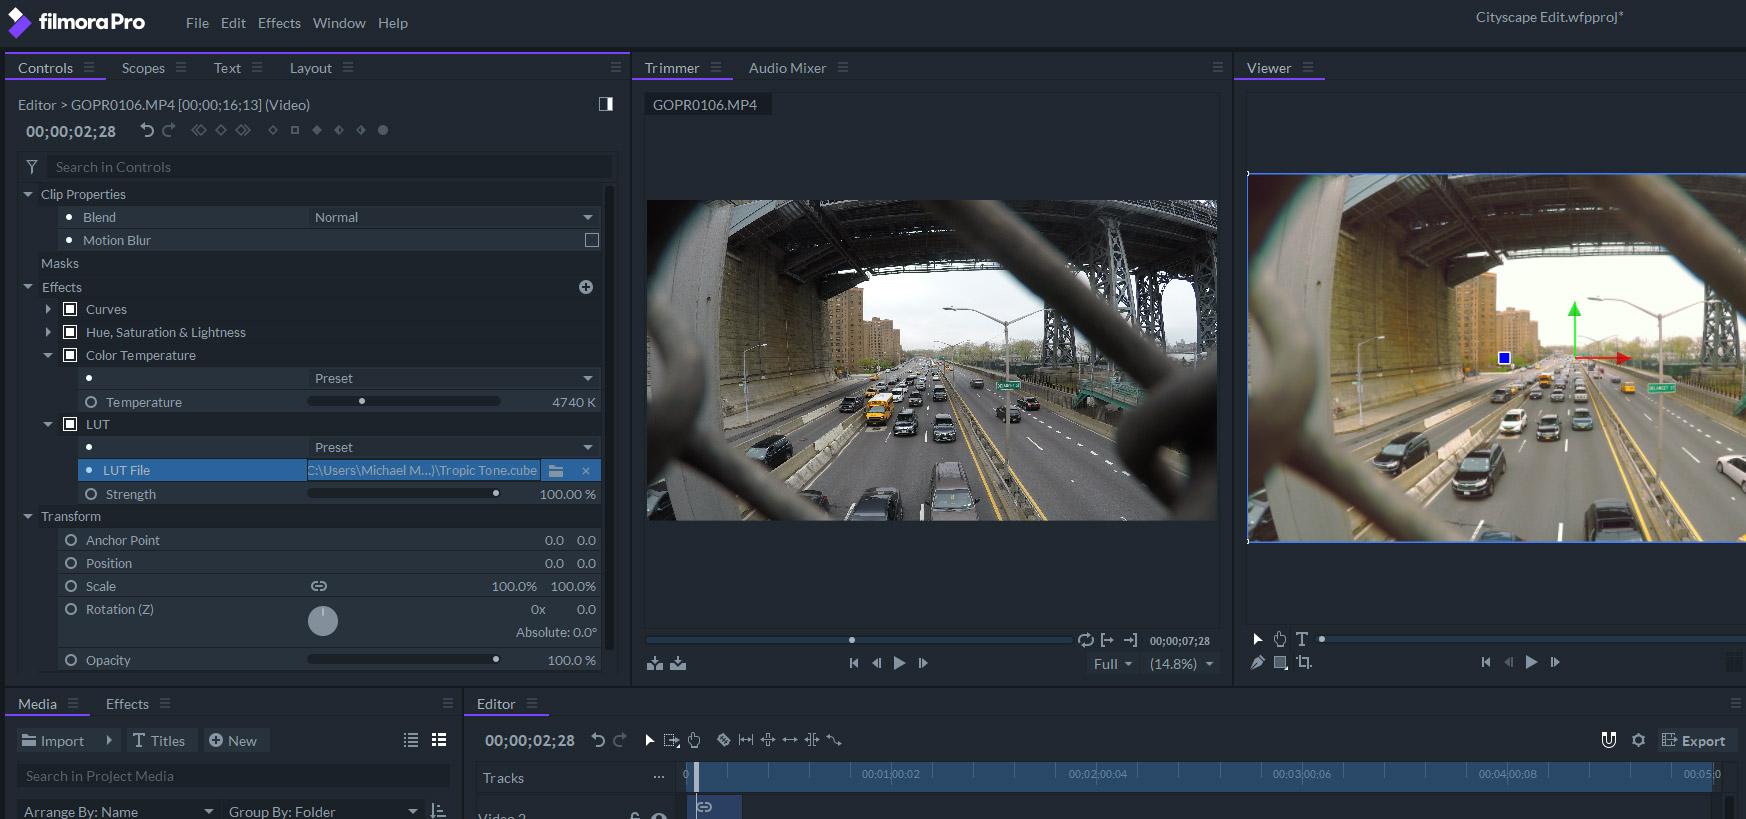 wondershare filmorapro add luts to footage